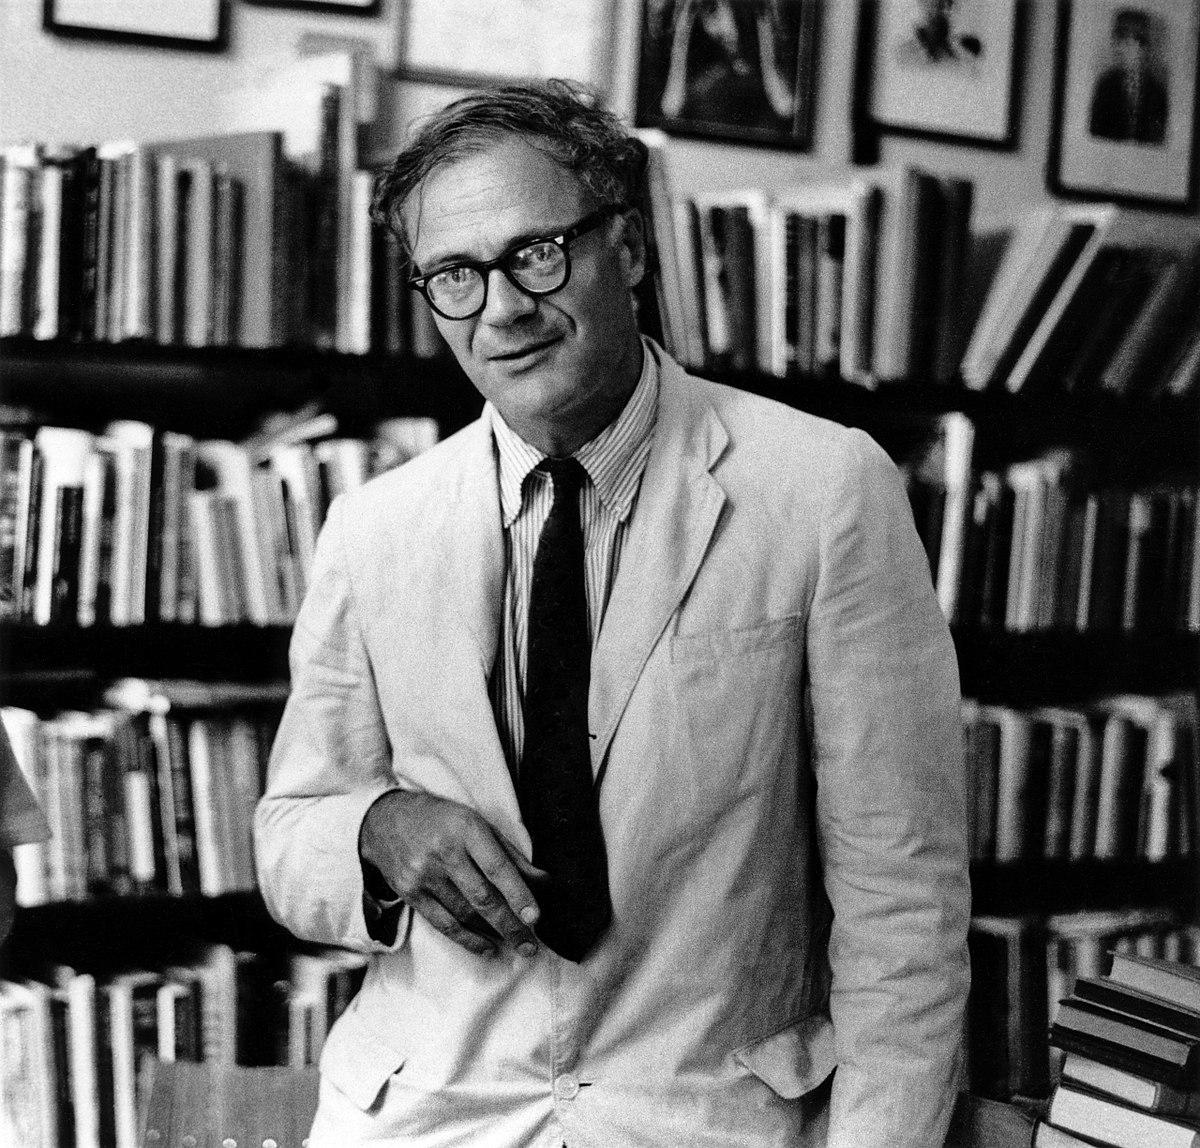 Robert Lowell, Bipolar Disorder and Creativity